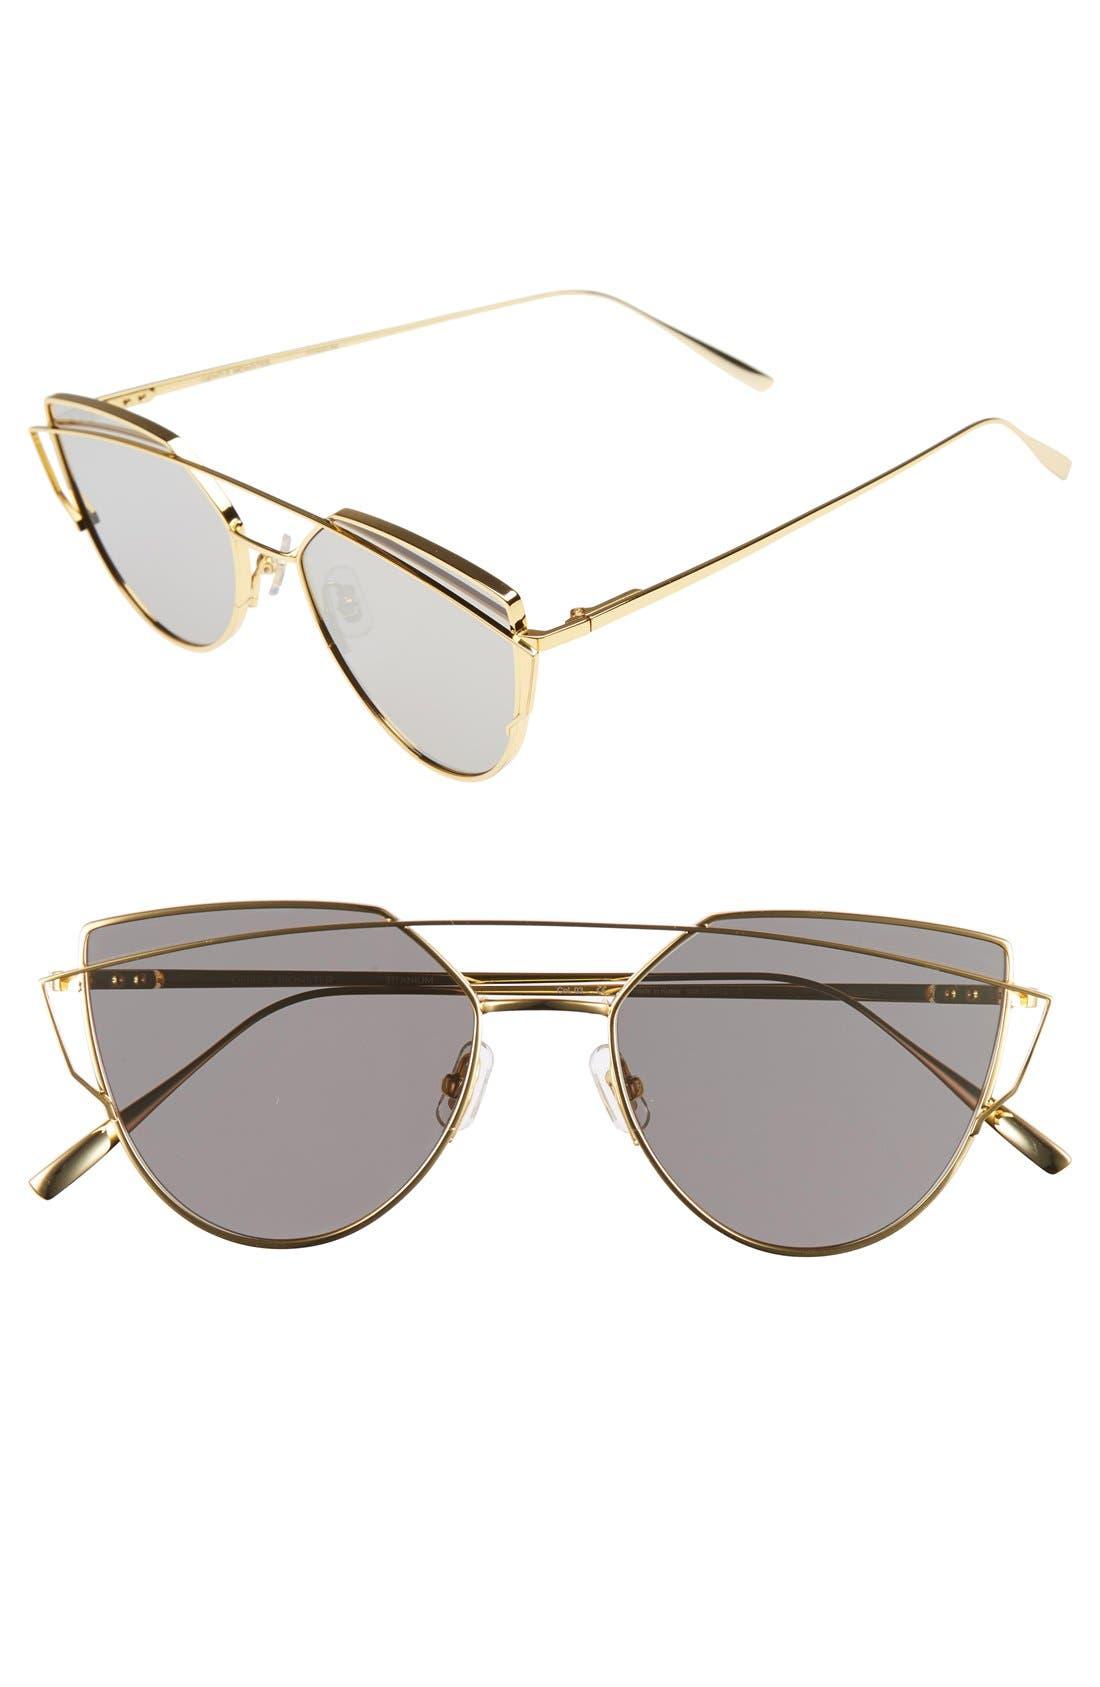 'Love Punch' 55mm Titanium Aviator Sunglasses,                             Main thumbnail 1, color,                             Gold